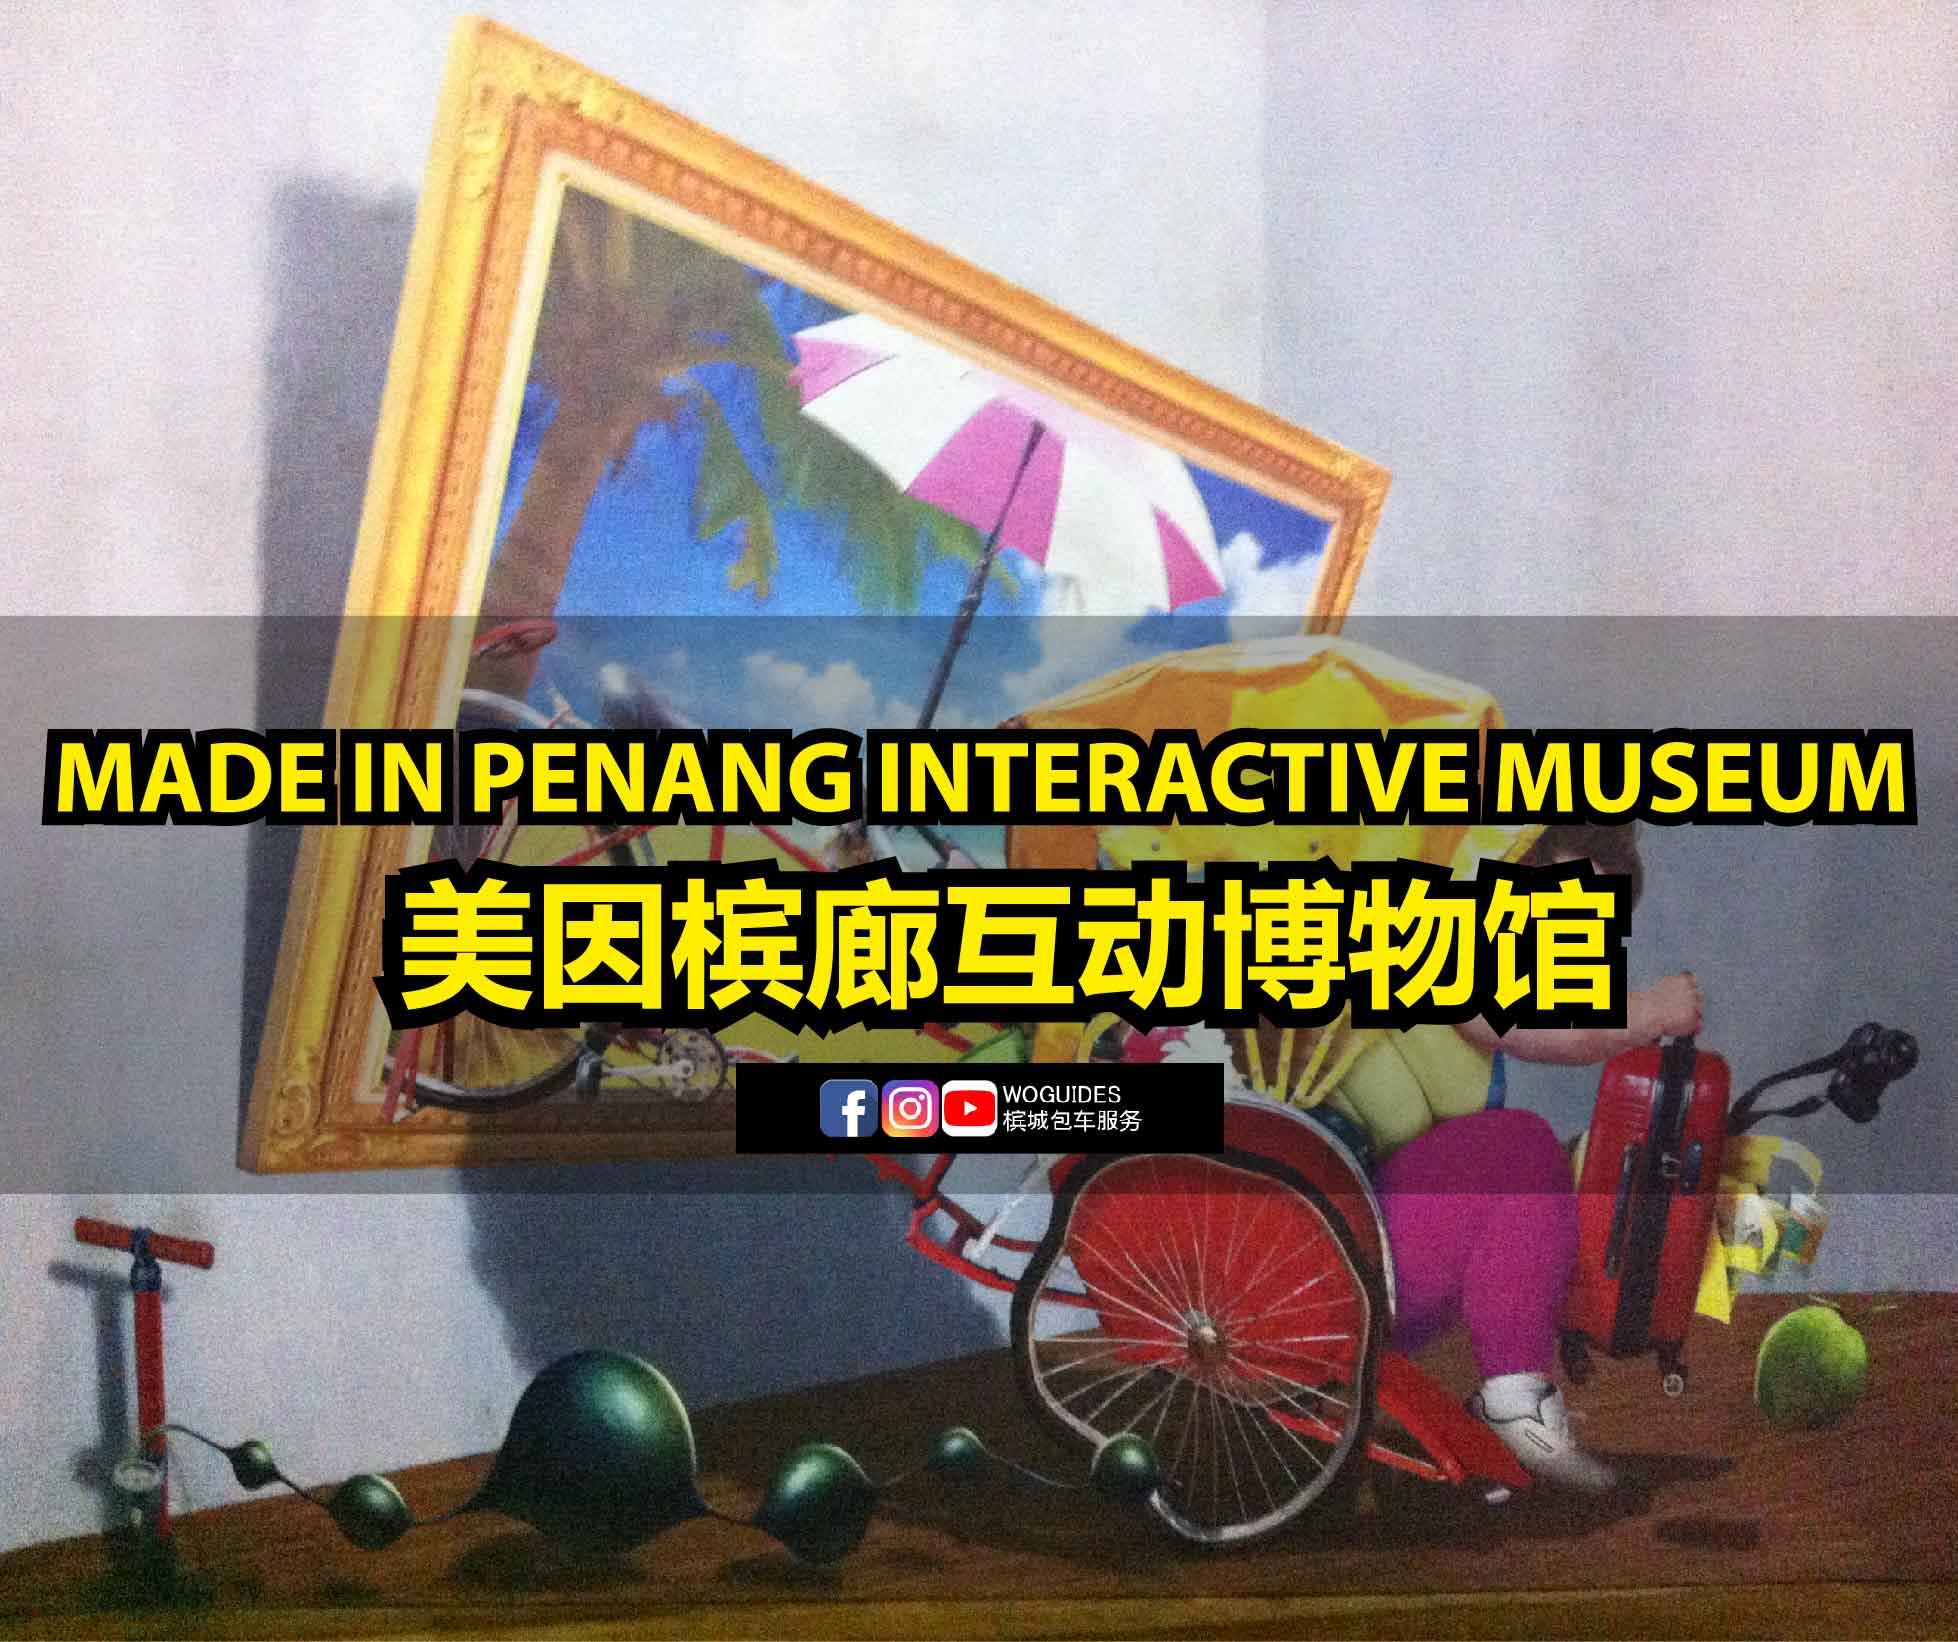 penang van rental - made in penang interactive musuem (1a)